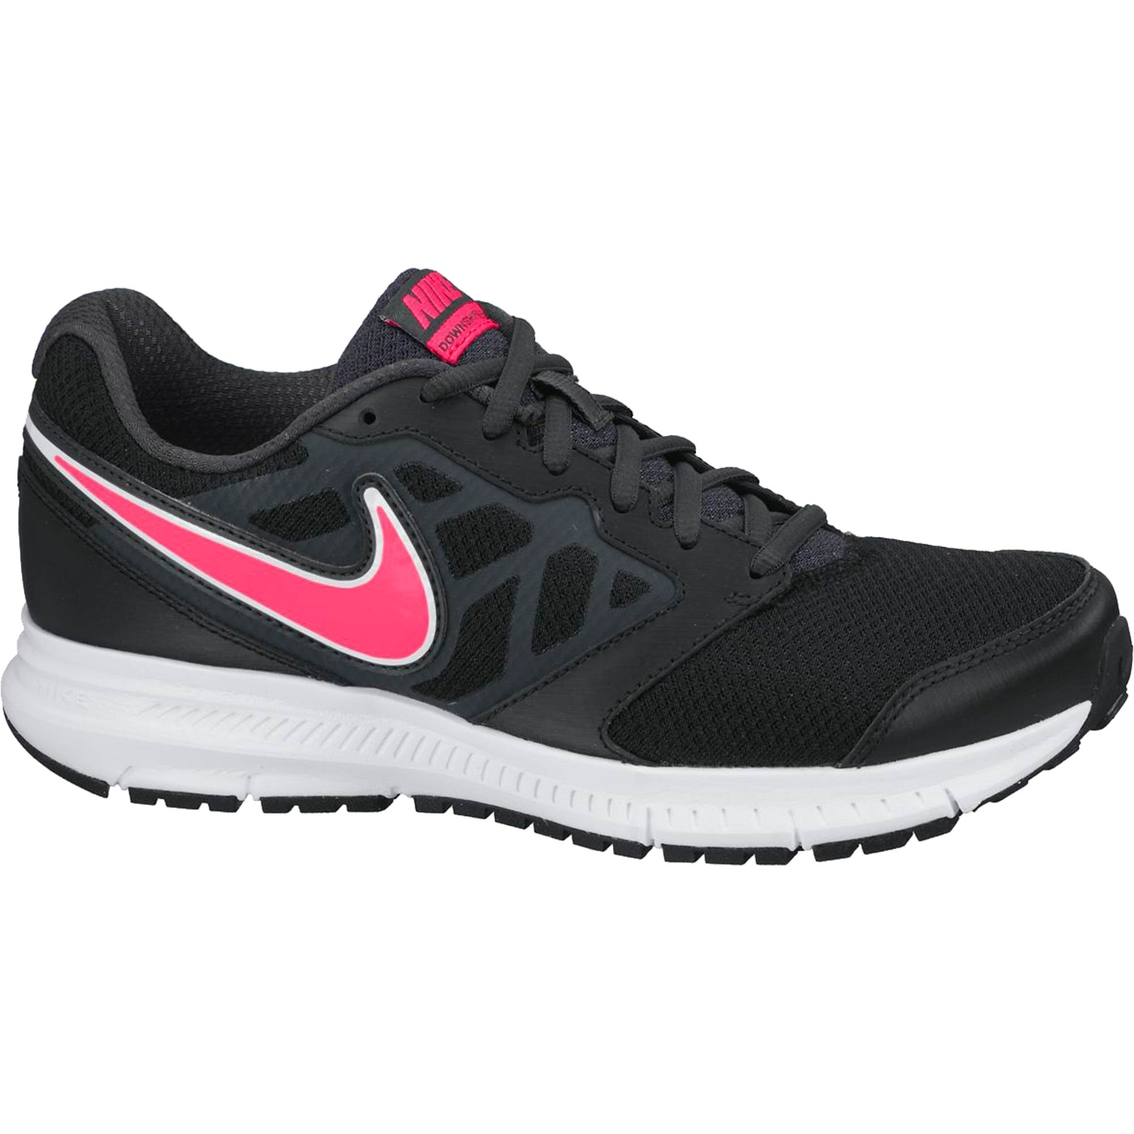 reputable site e348c b3ddf Nike Women s Downshifter 6 Running Shoes